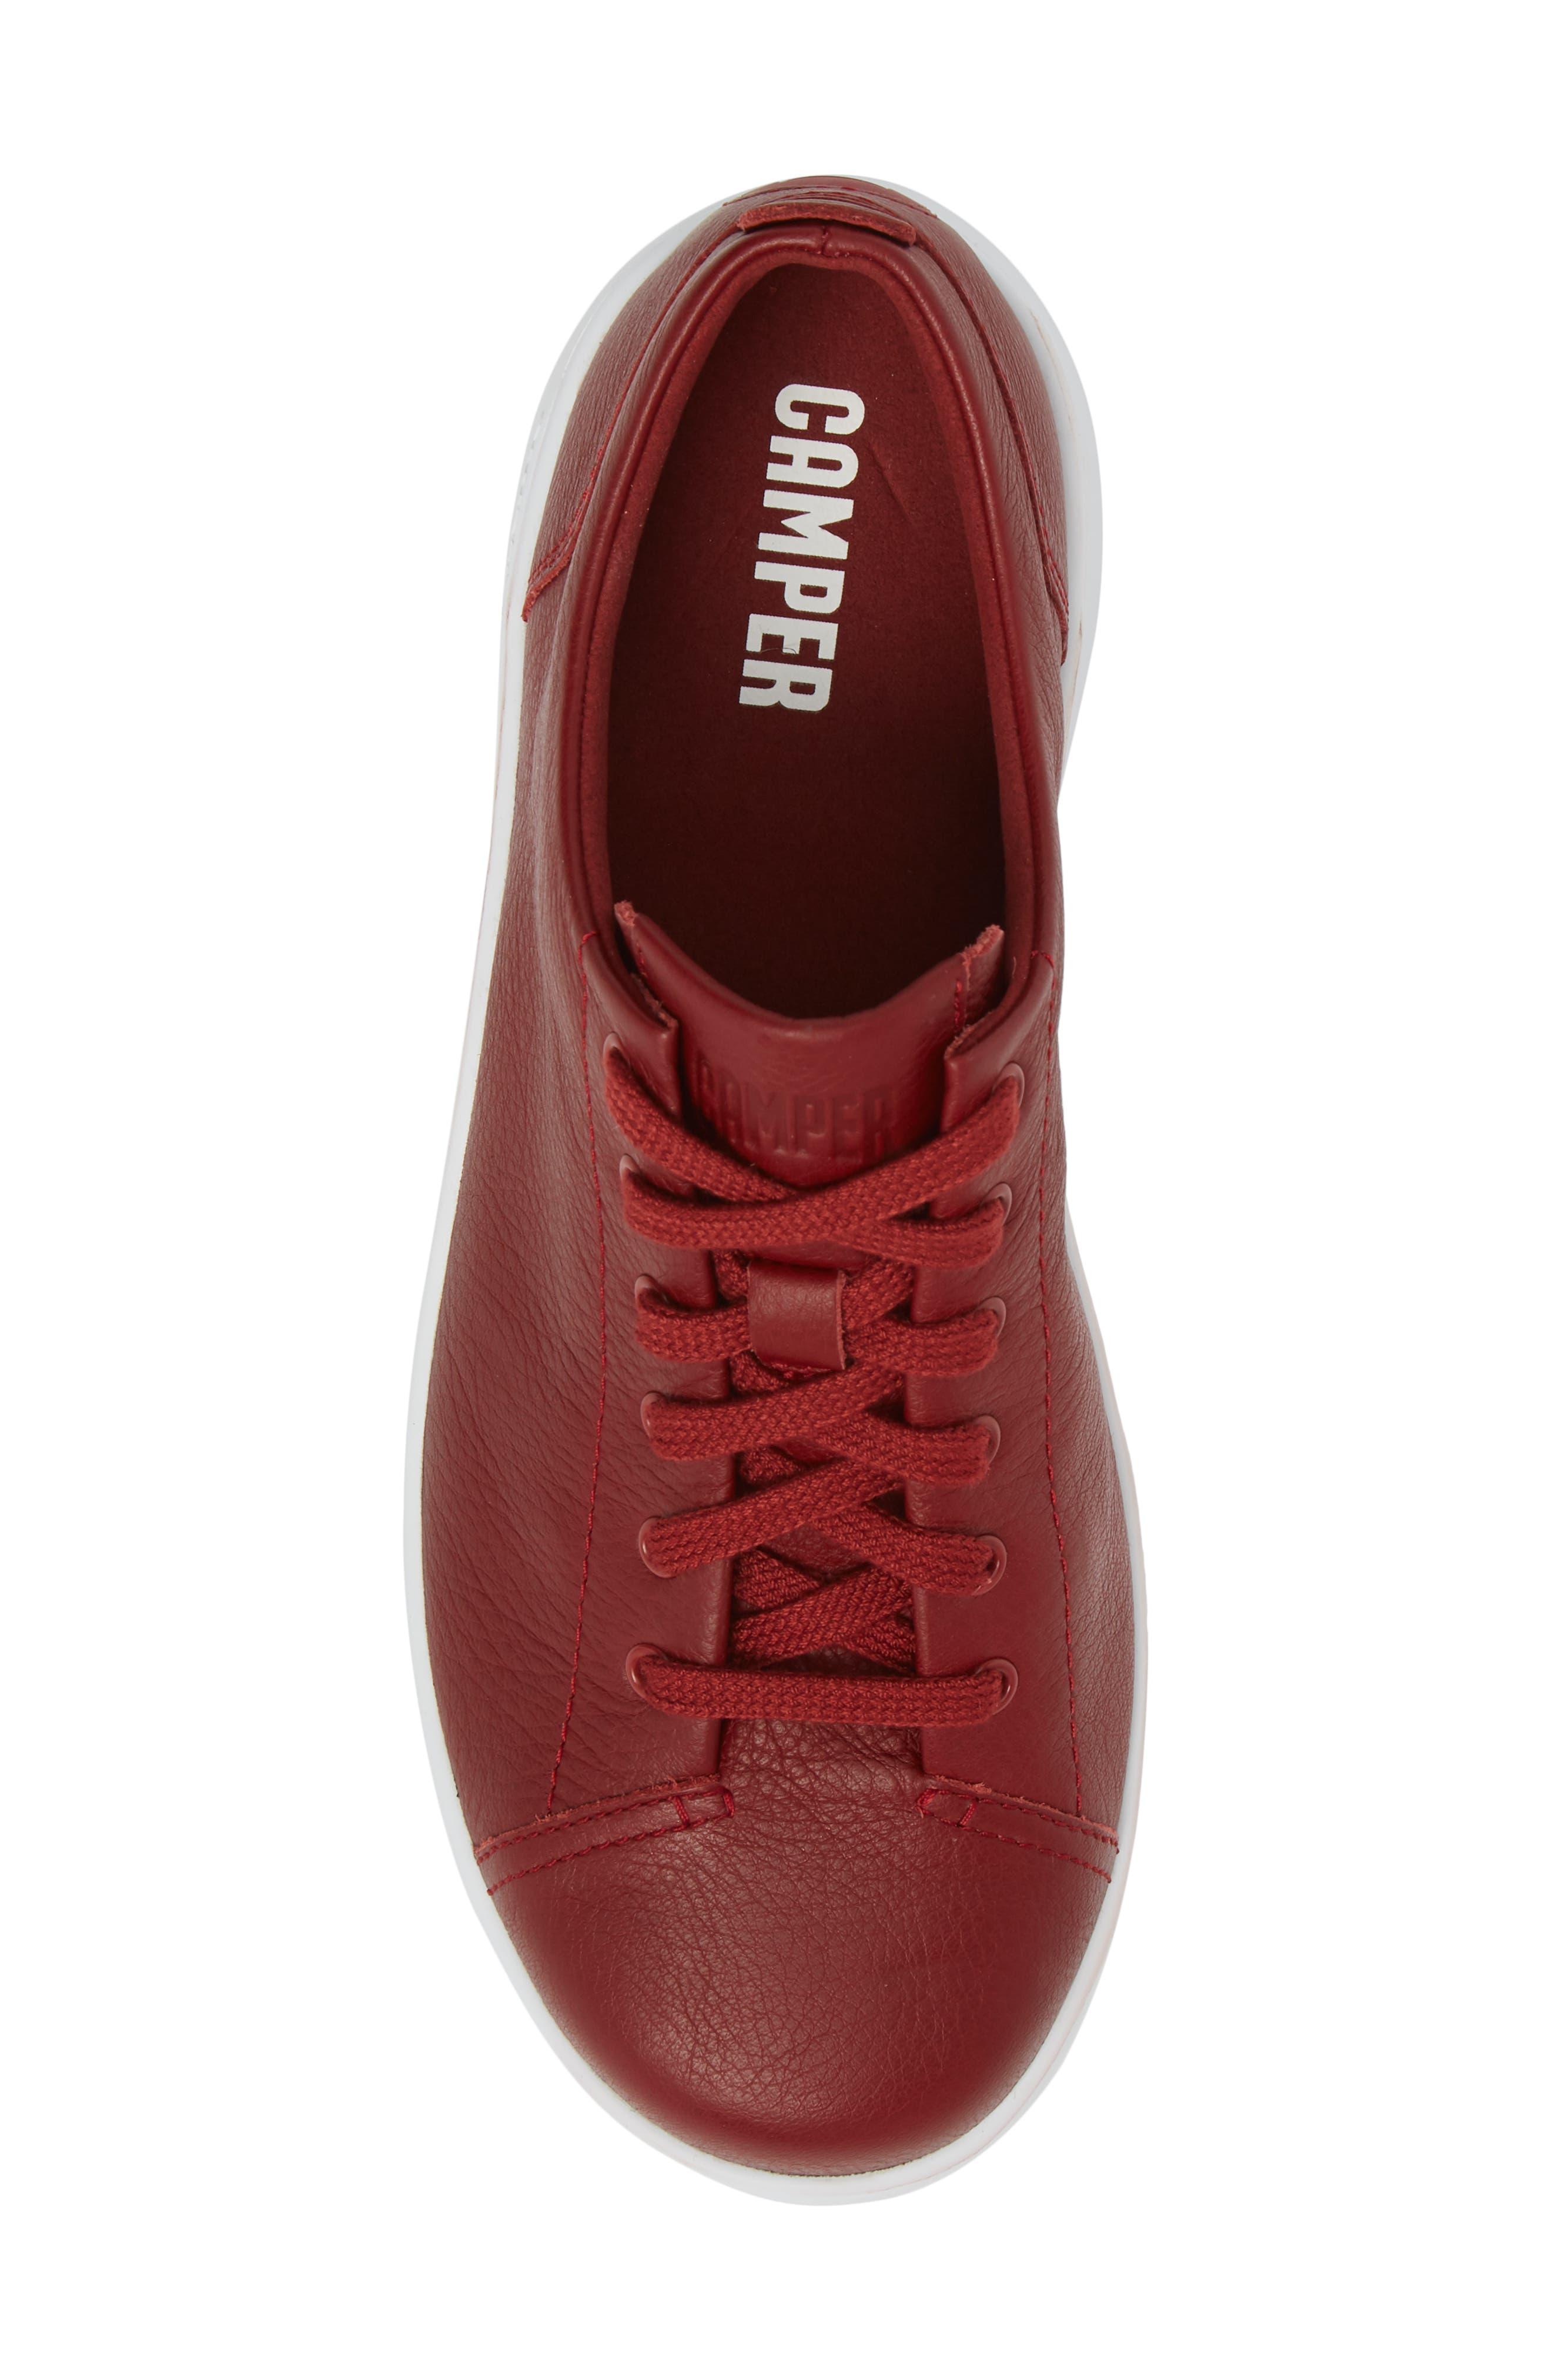 CAMPER,                             Runner Up Sneaker,                             Alternate thumbnail 5, color,                             DARK RED LEATHER